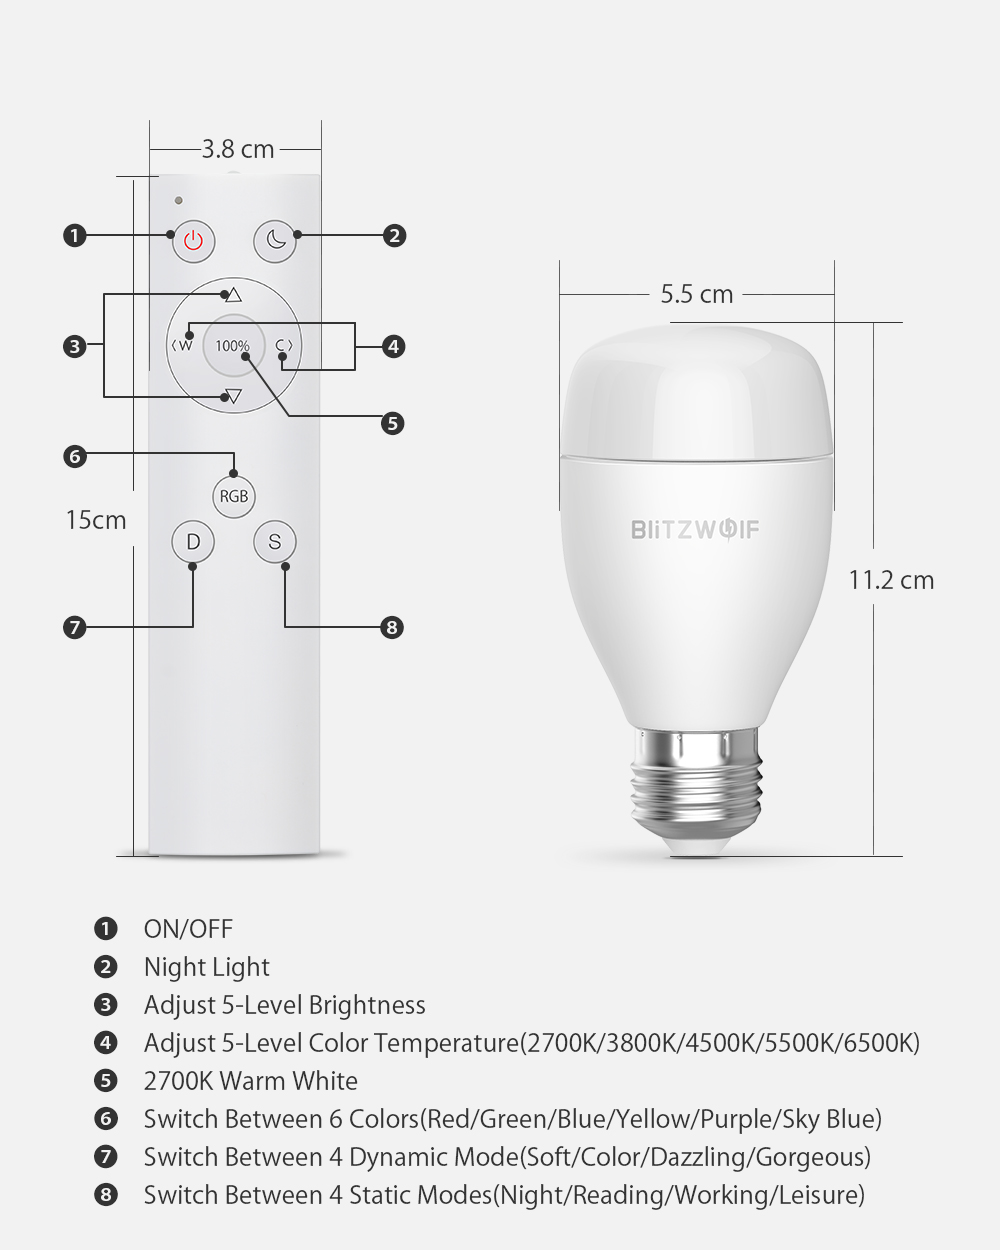 Smart bulb - BlitzWolf® BW-LT27, E27, 850m, 9W, 2700-6500K,